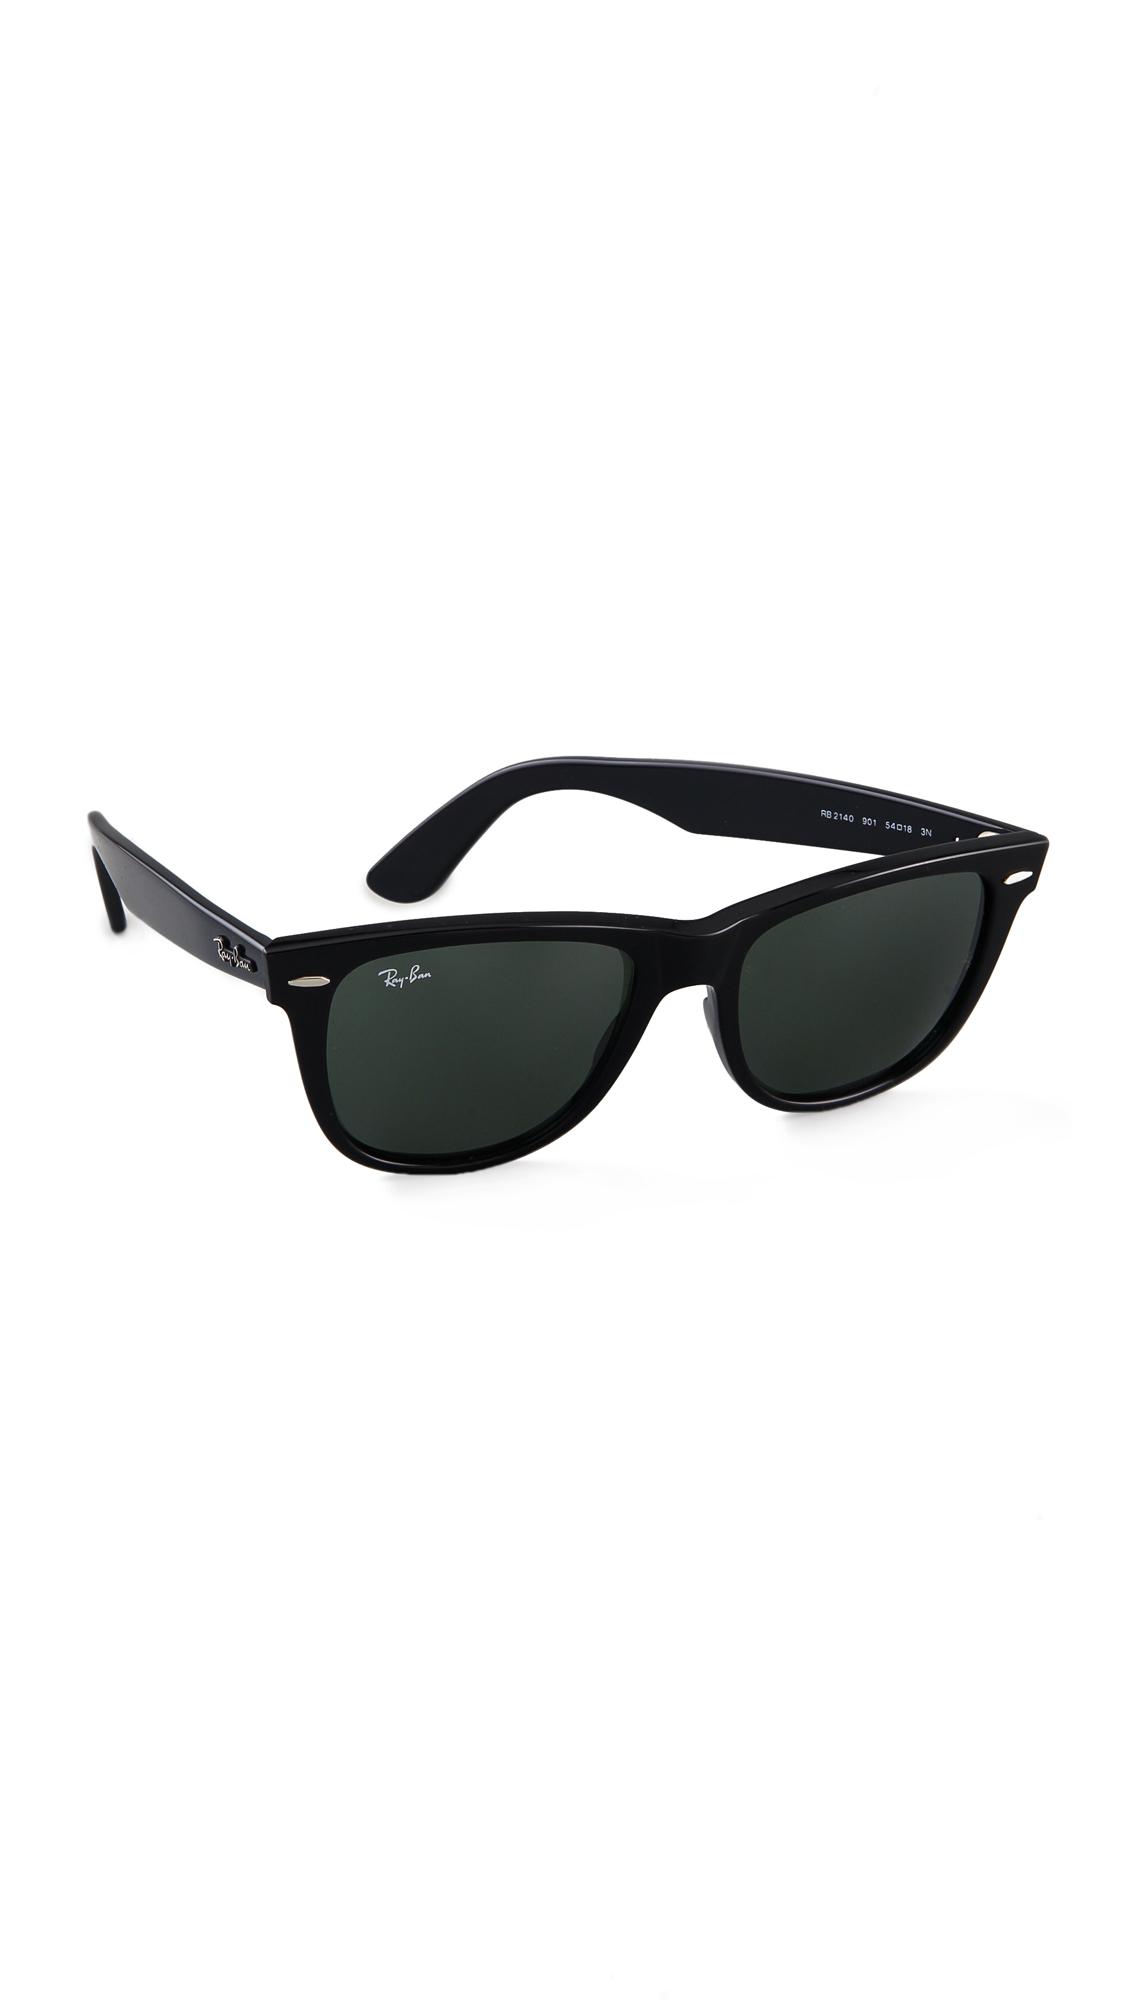 Ray-Ban Outsiders Oversized Wayfarer Sunglasses | SHOPBOP